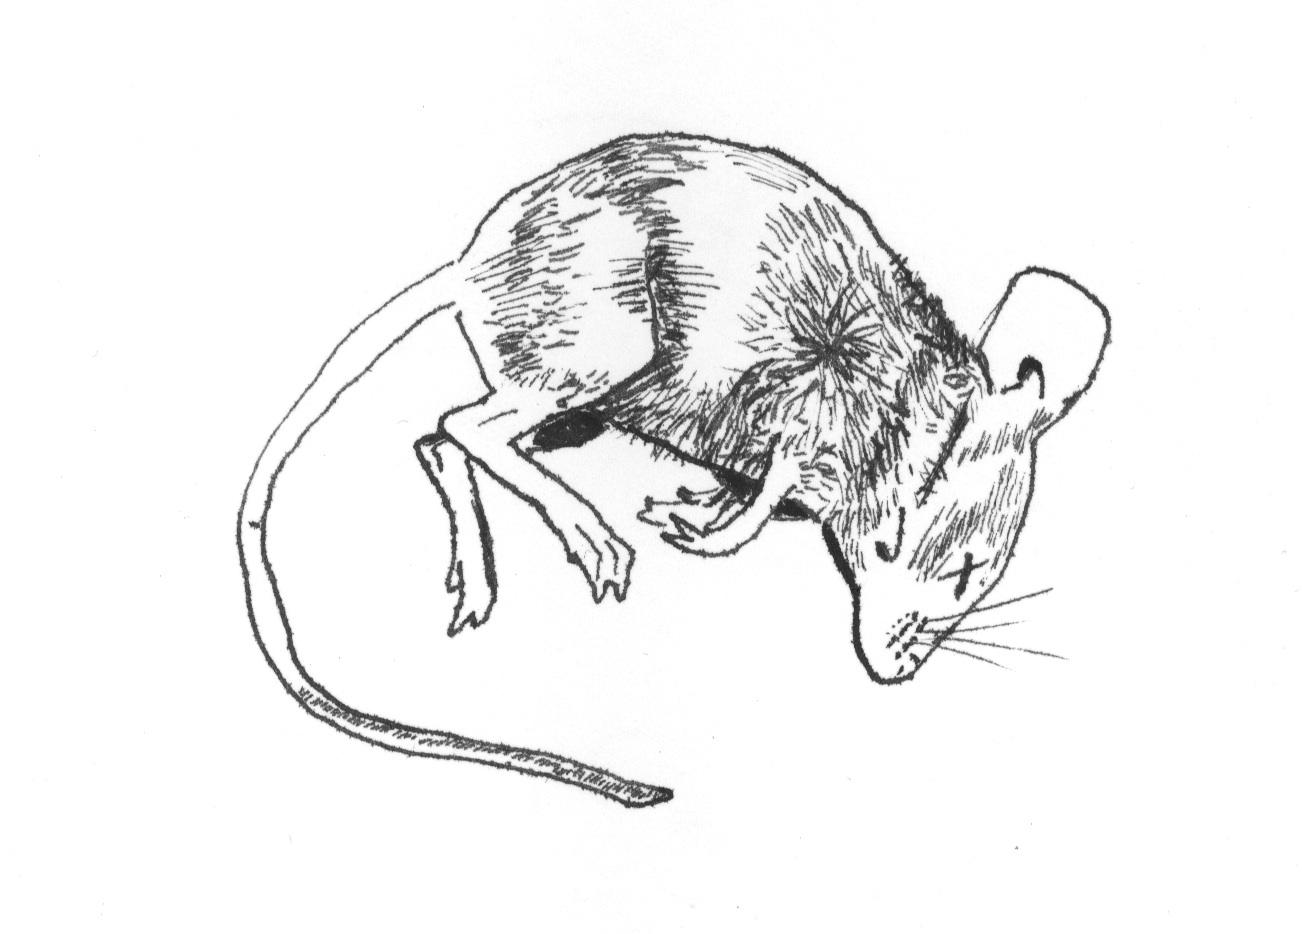 Drawn rodent illustration Pen Schenker · and Work